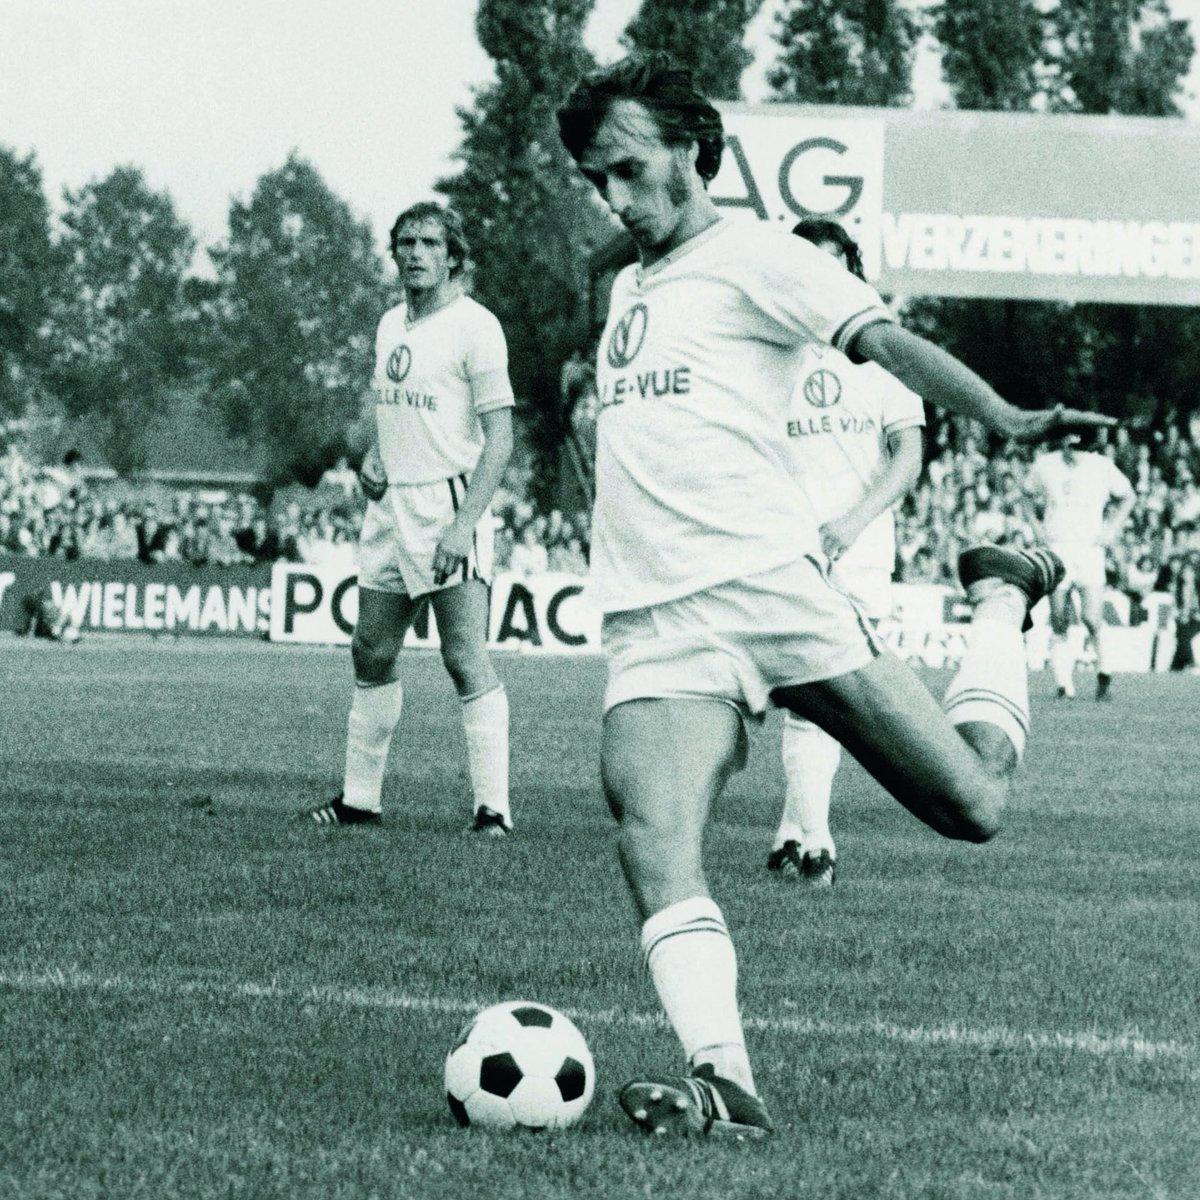 One of RSCA's true legends has sadly passed away. Prachtige voetballer, clubicoon ...l'homme serpent, le plus bel ailier gauche qu'ait connu le Sporting ... Veel sterkte aan de familie en aan iedereen die dicht bij hem stond. RIP Robbie Rensenbrink #LEGEND https://t.co/CI8Nkw0iw4